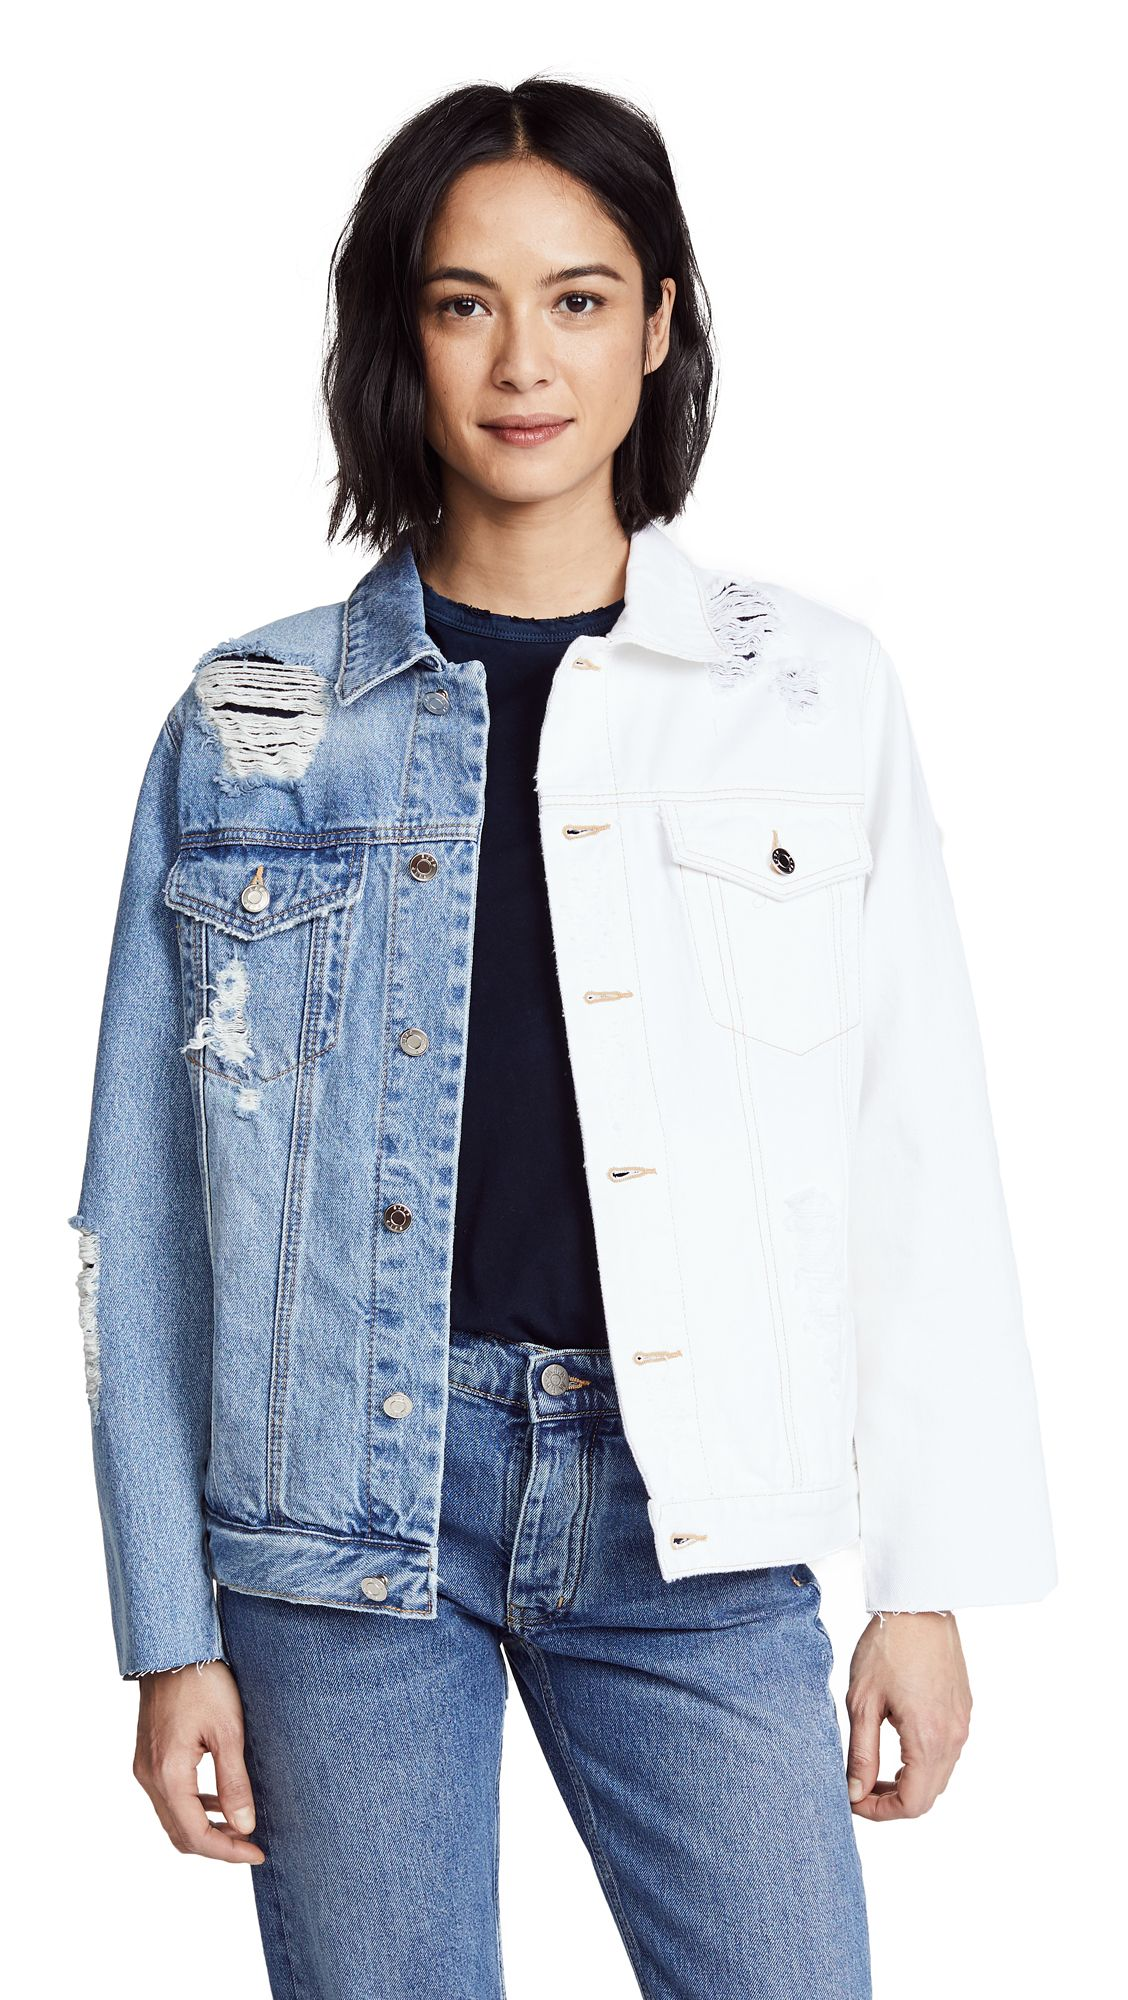 Sjyp Half And Half Denim Jacket Sjyp Cloth Denim Jacket Jackets Sjyp [ 2000 x 1128 Pixel ]